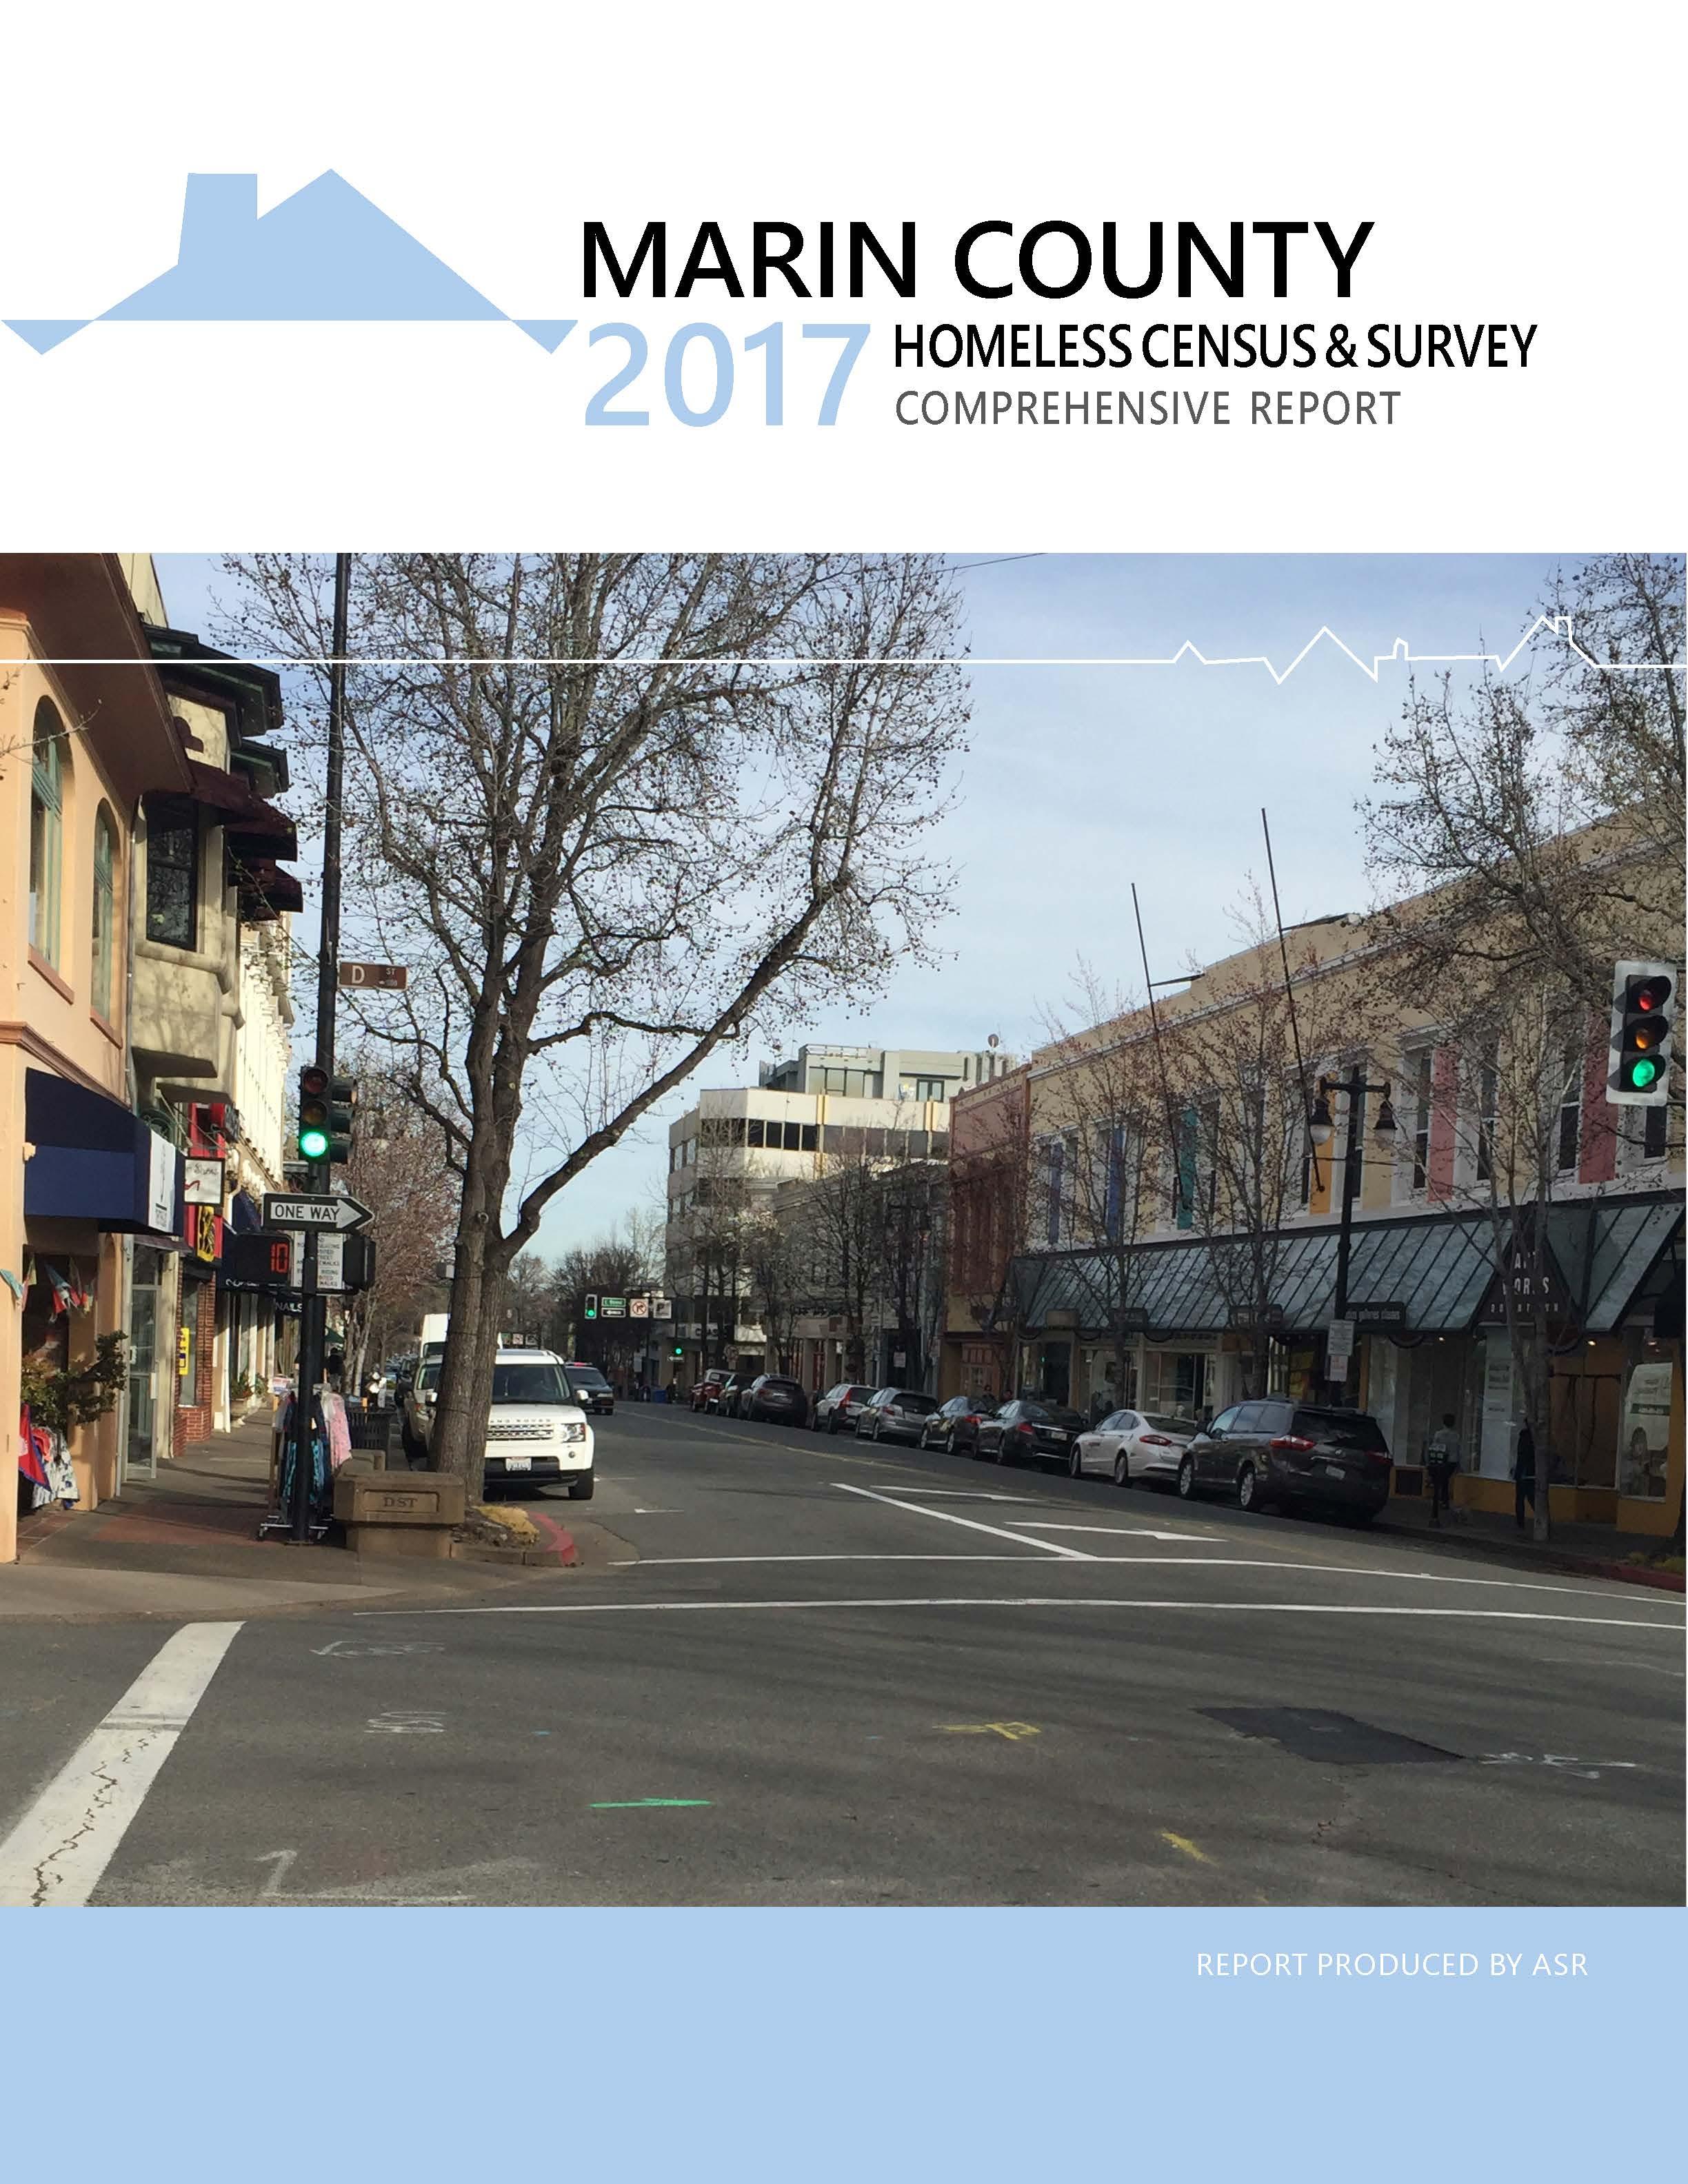 2017HIRDReport-MarinCounty - 07182017 1.jpg